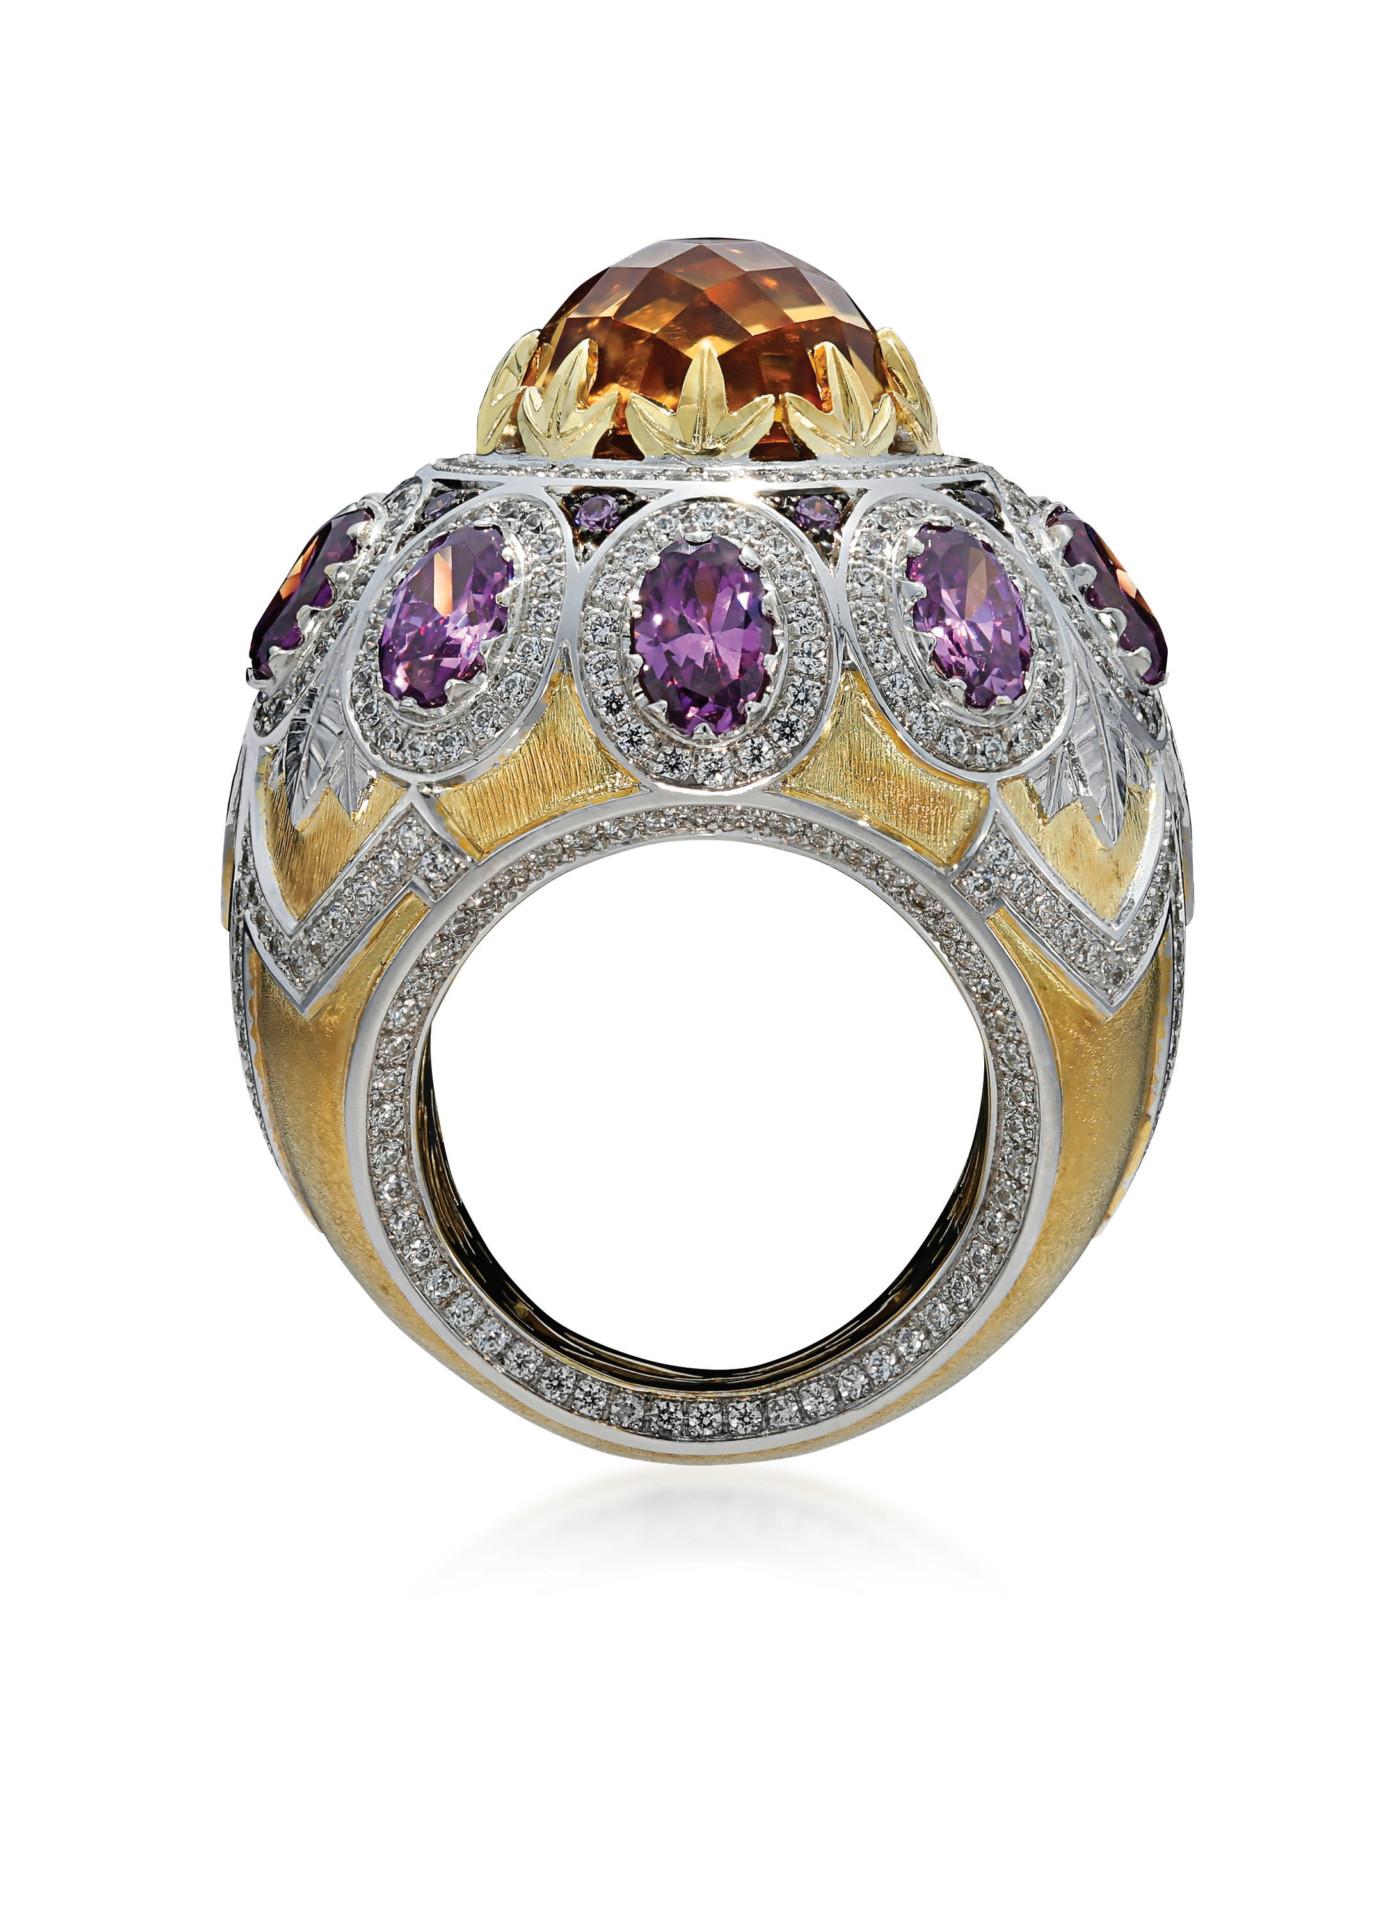 17th annual saul bell design winners ganoksin jewelry for Garcia s jewelry bench